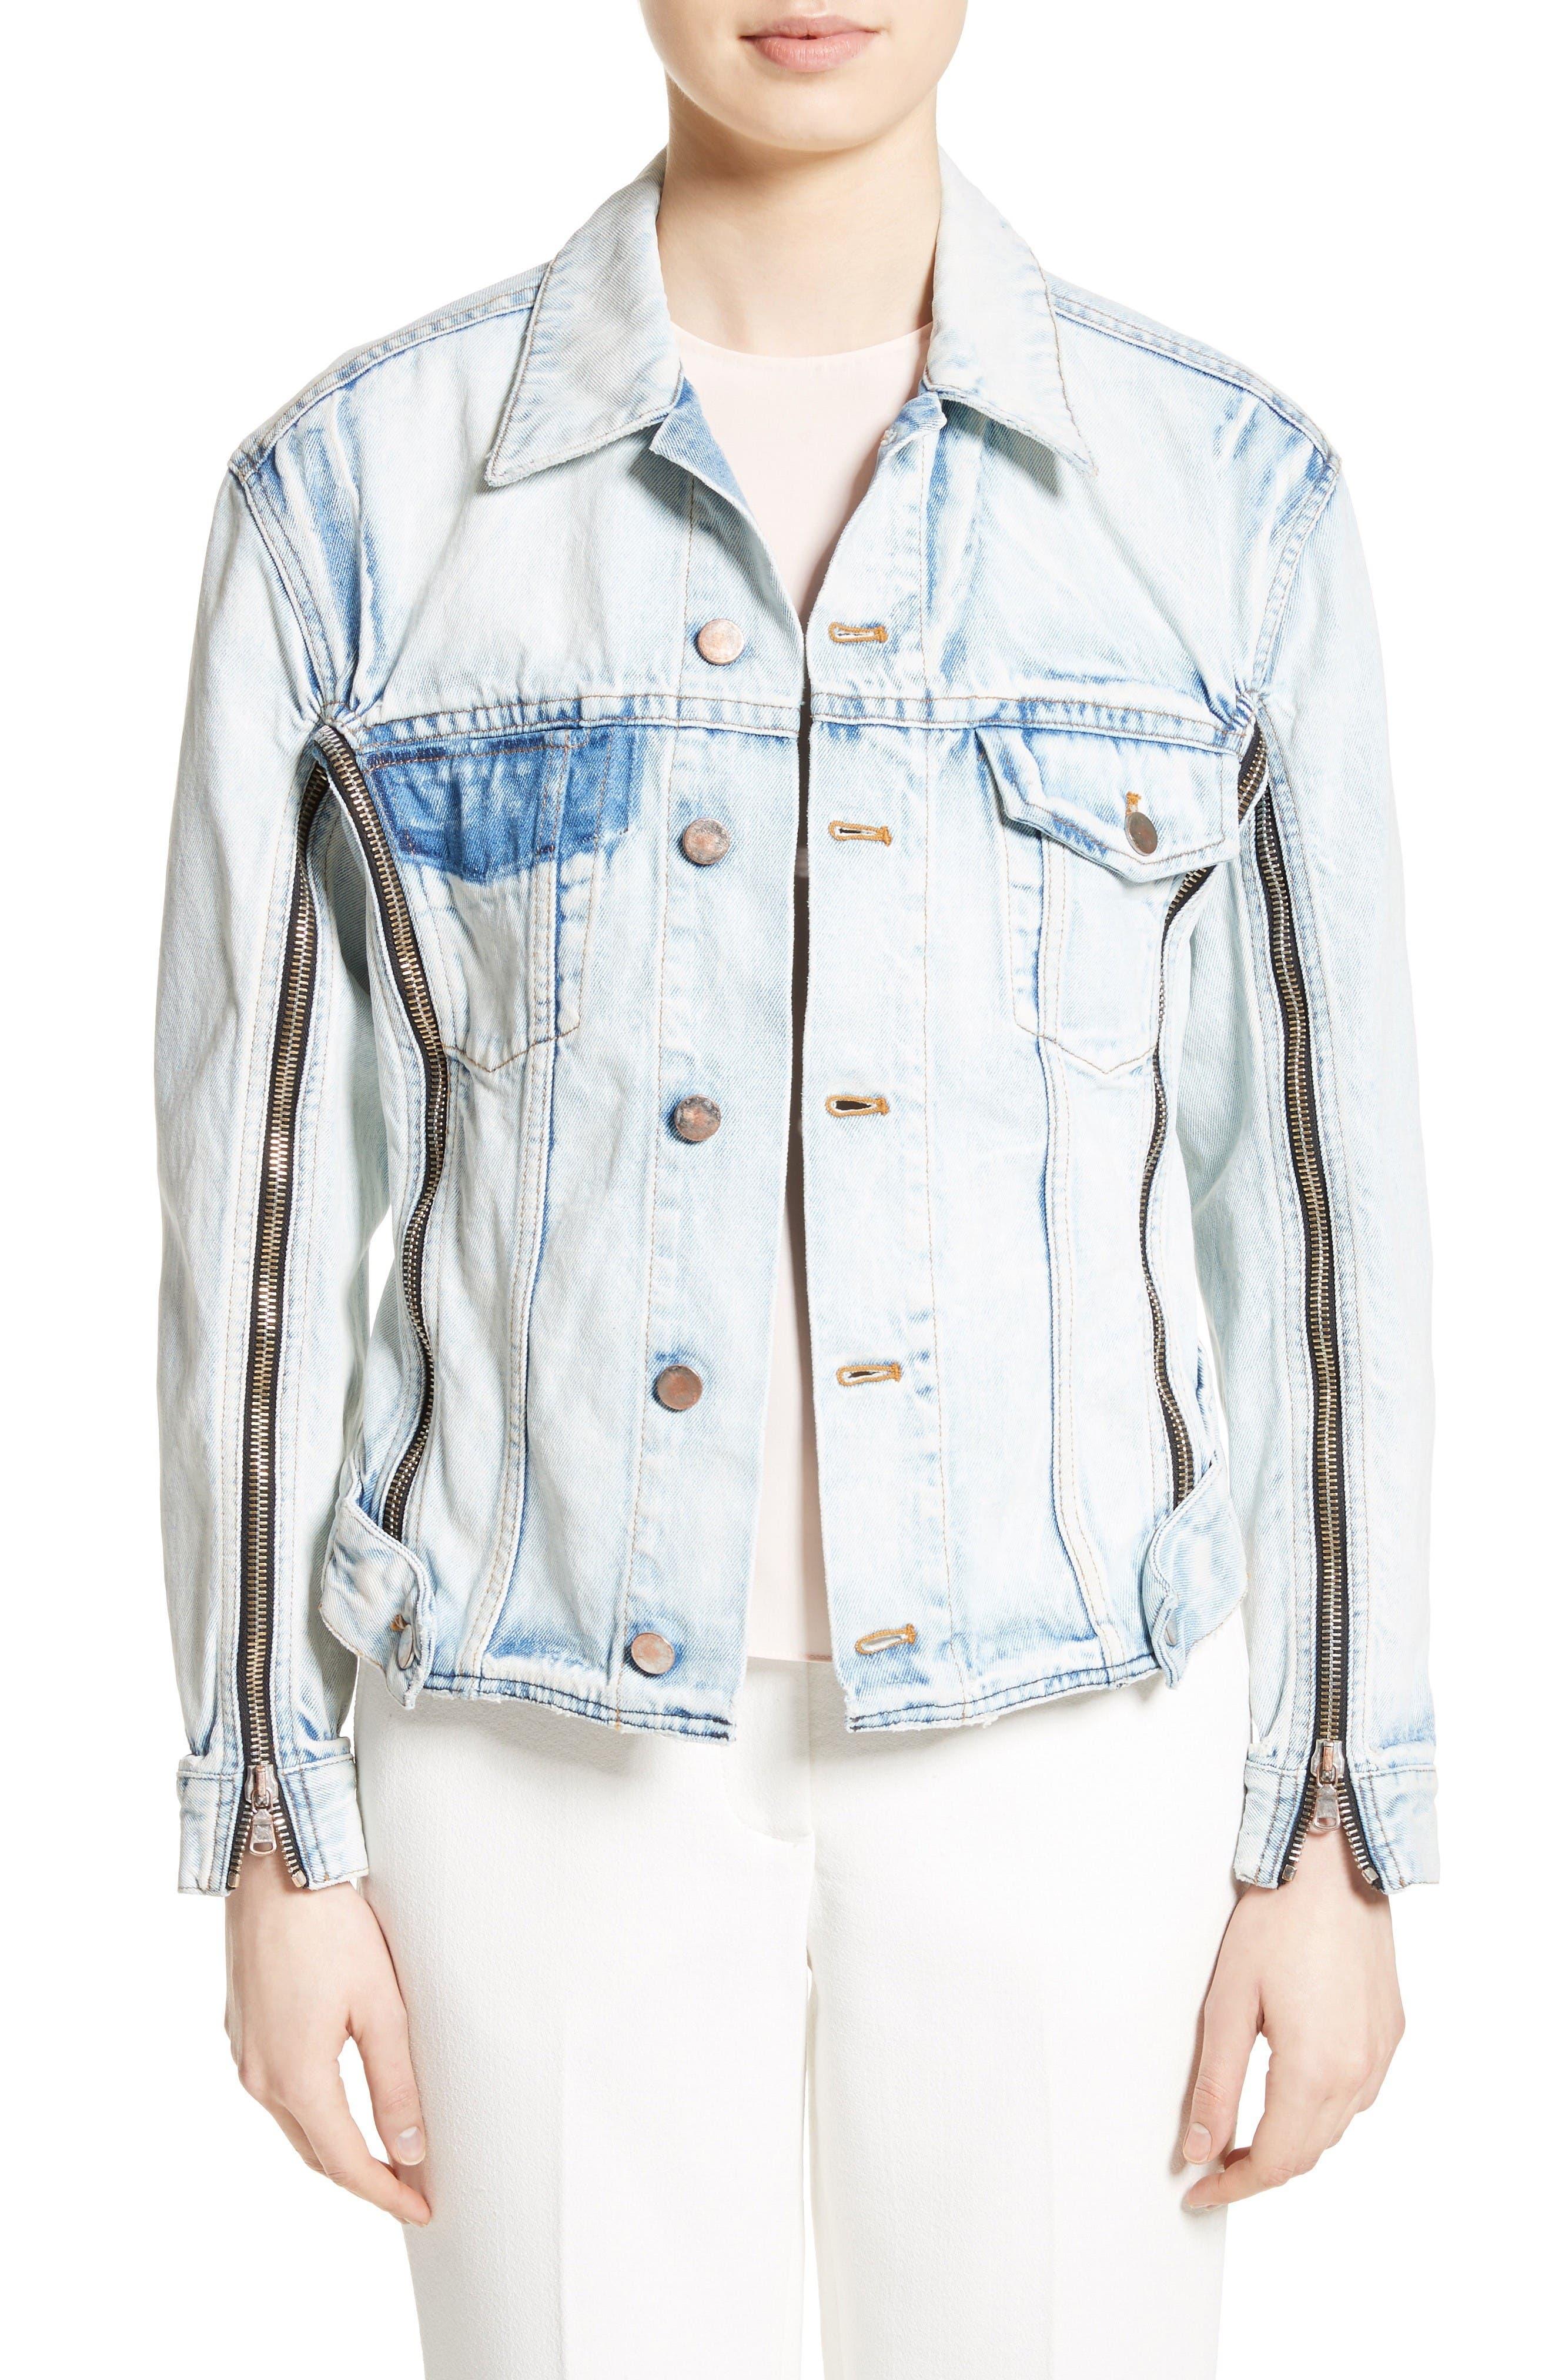 3.1 PHILLIP LIM Zipper Detail Denim Jacket